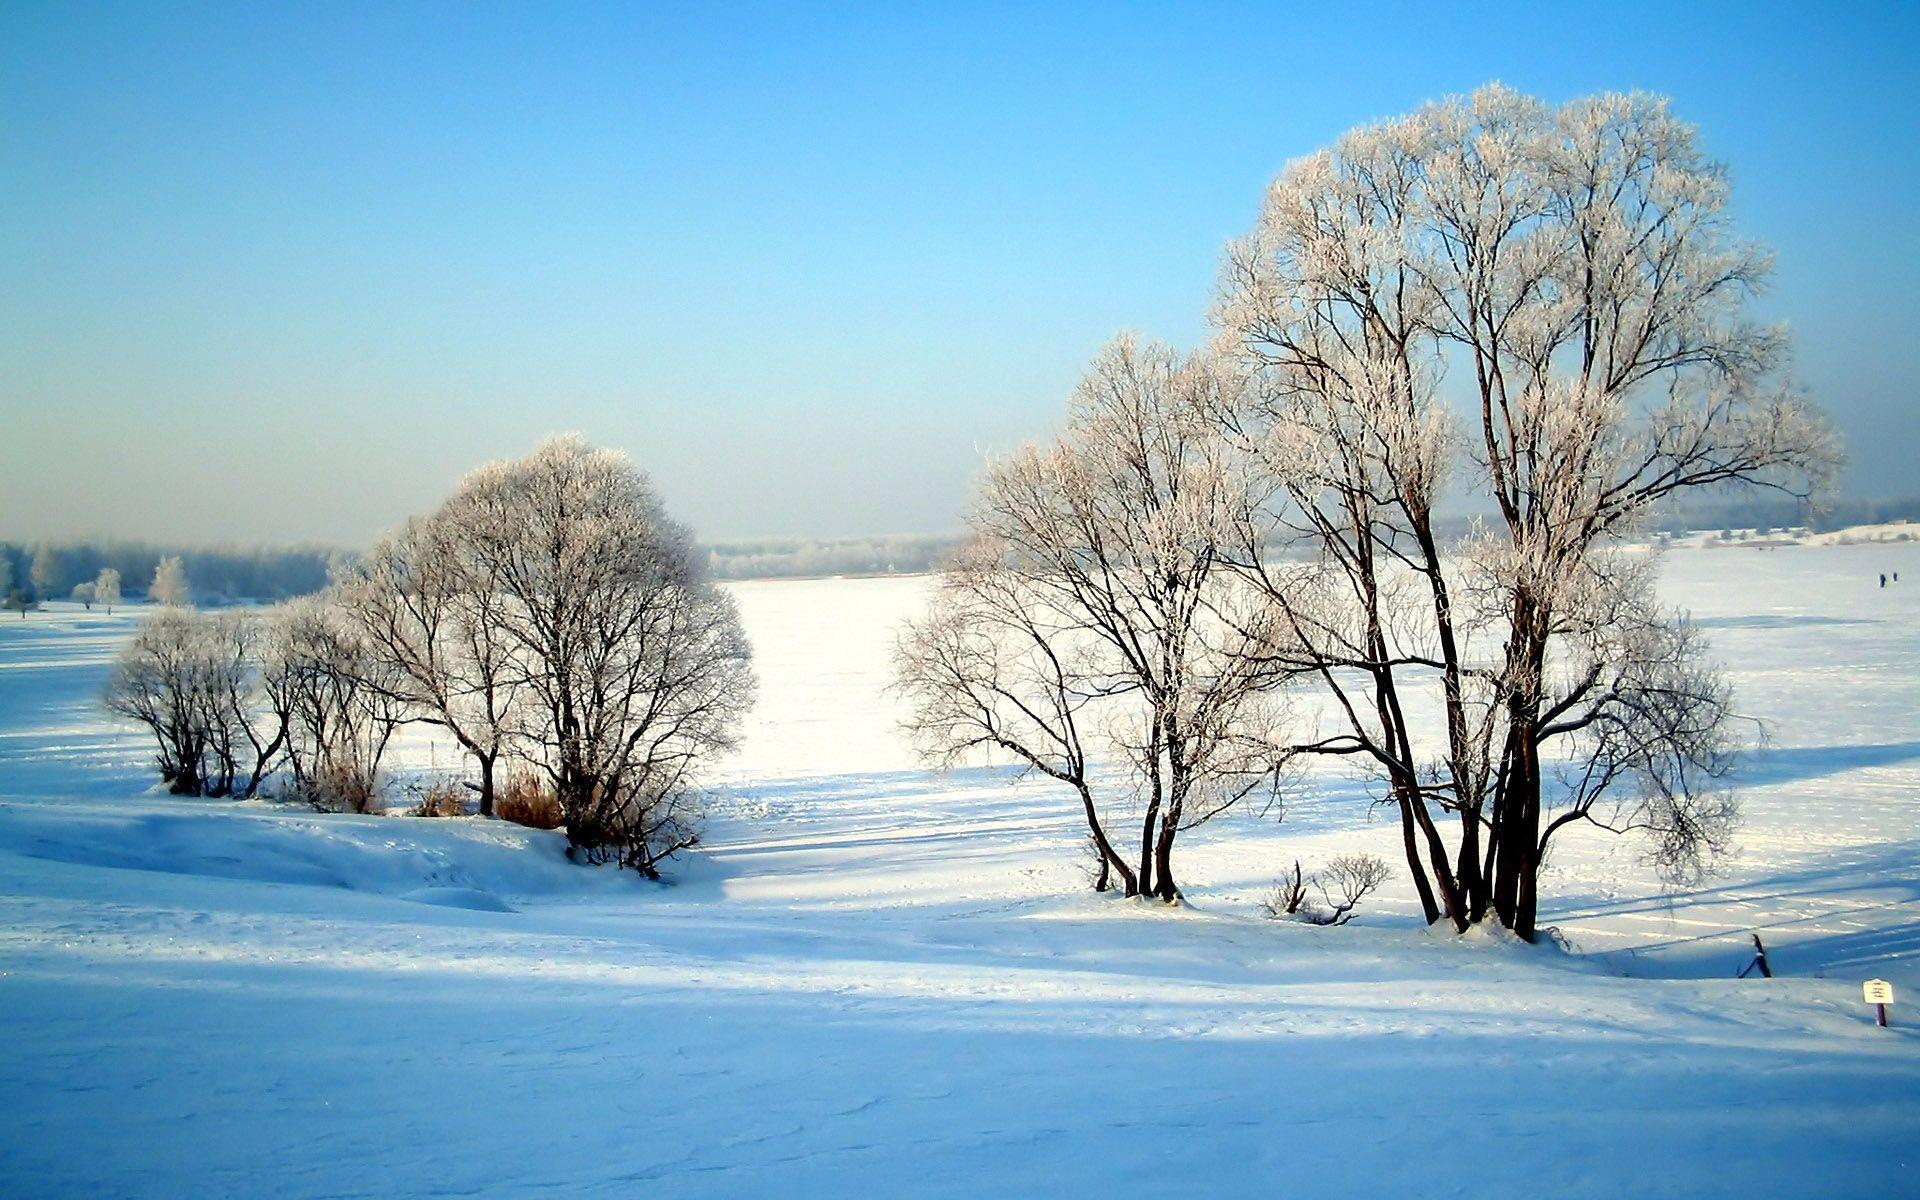 1920 1200 Widescreen Winter Snow Scenes Winter Wallpaper Winter